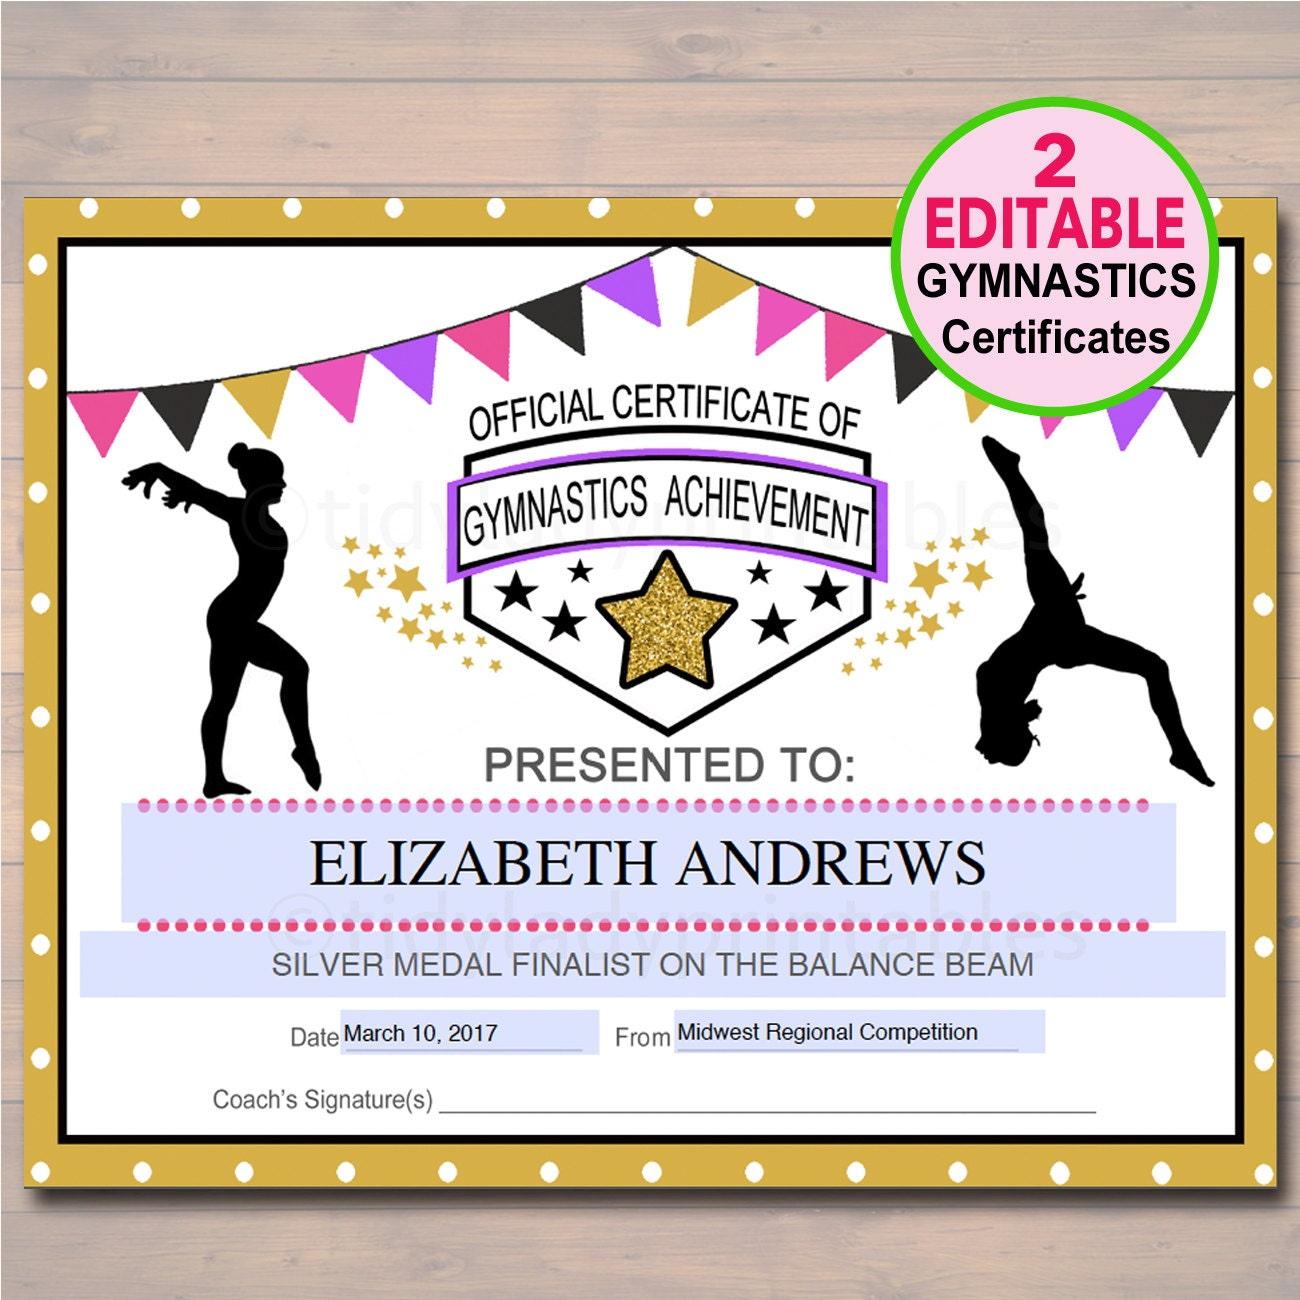 Editable Gymnastics Certificates